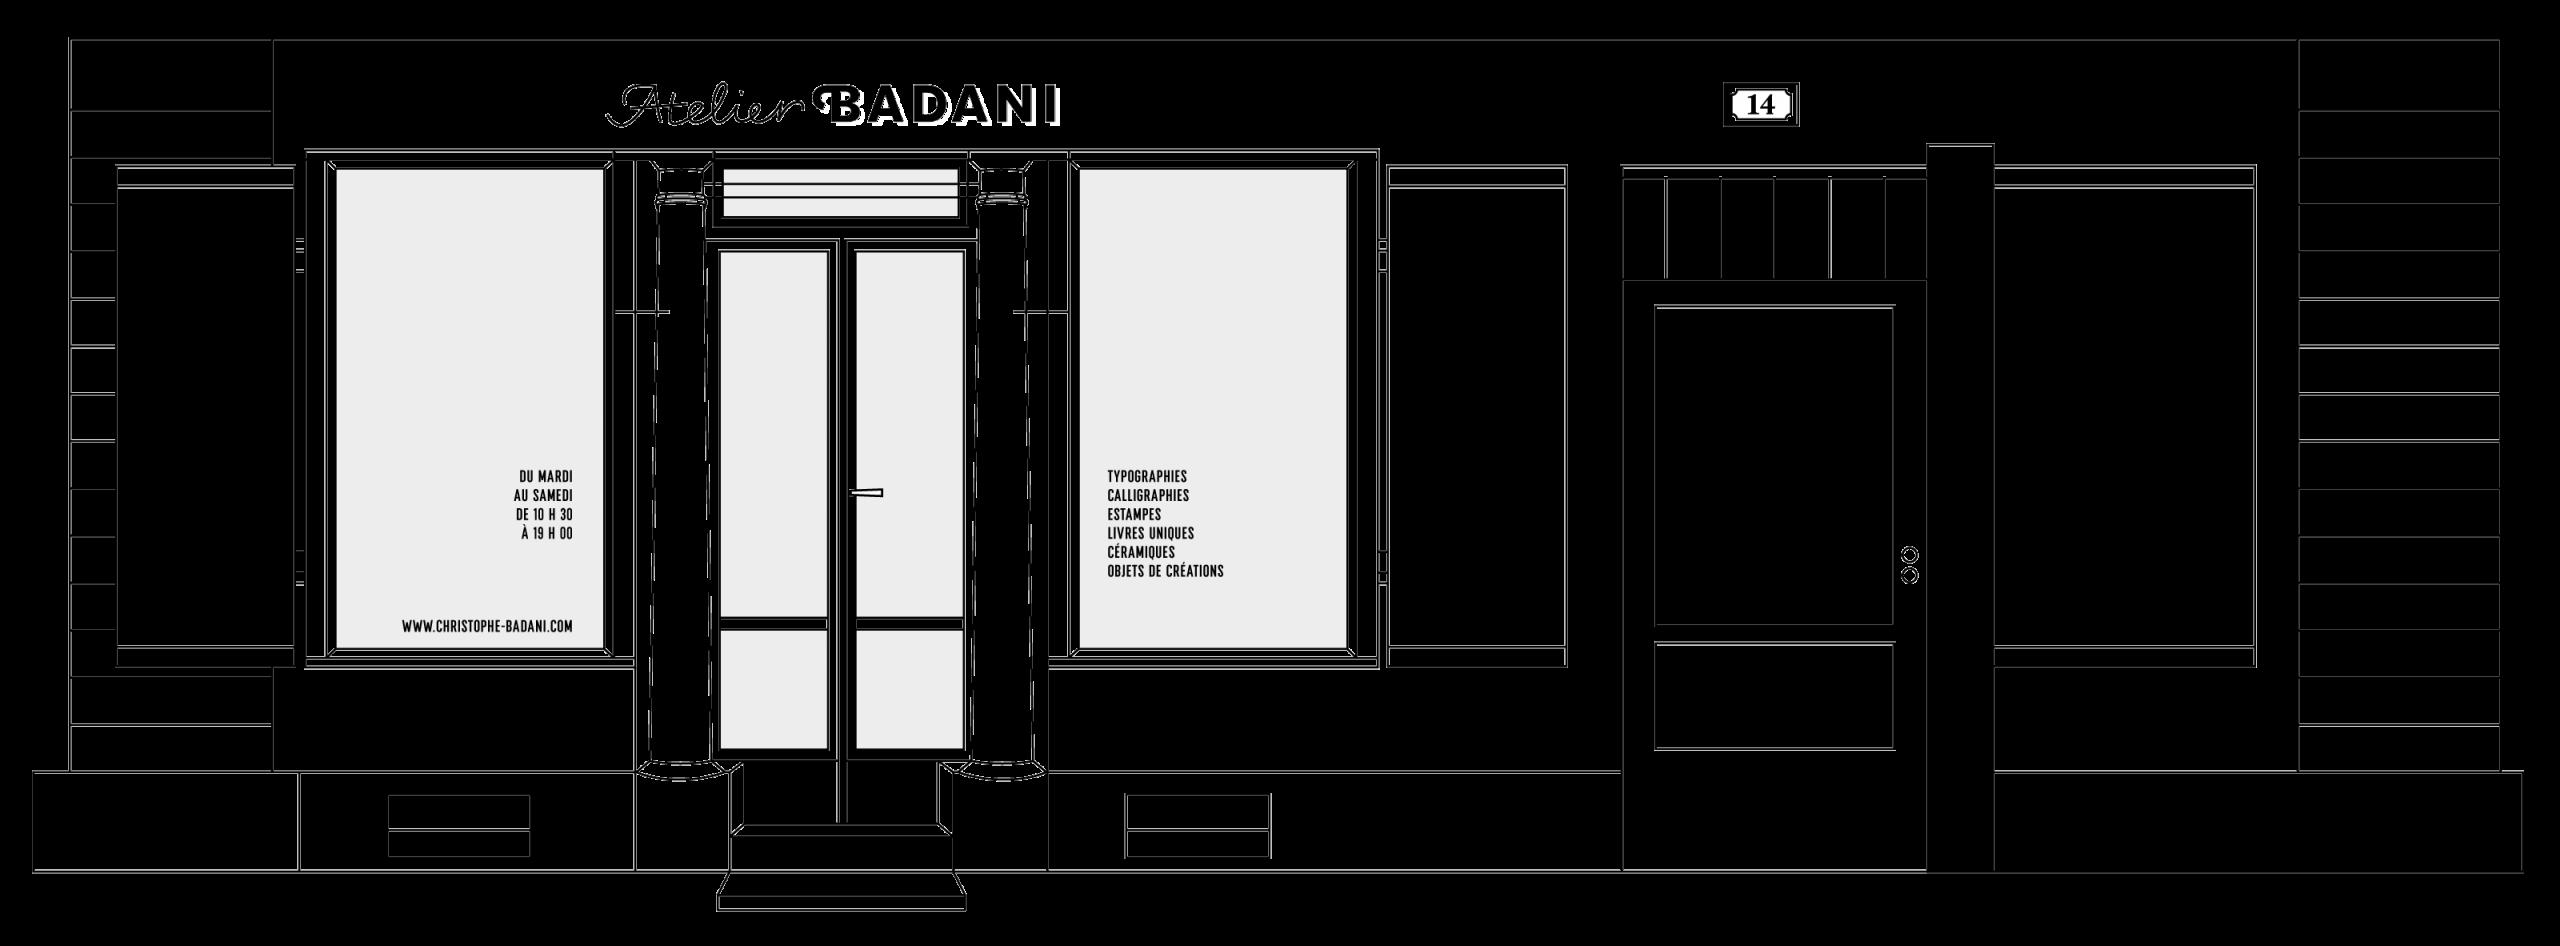 Atelier Galerie d'Art Badani